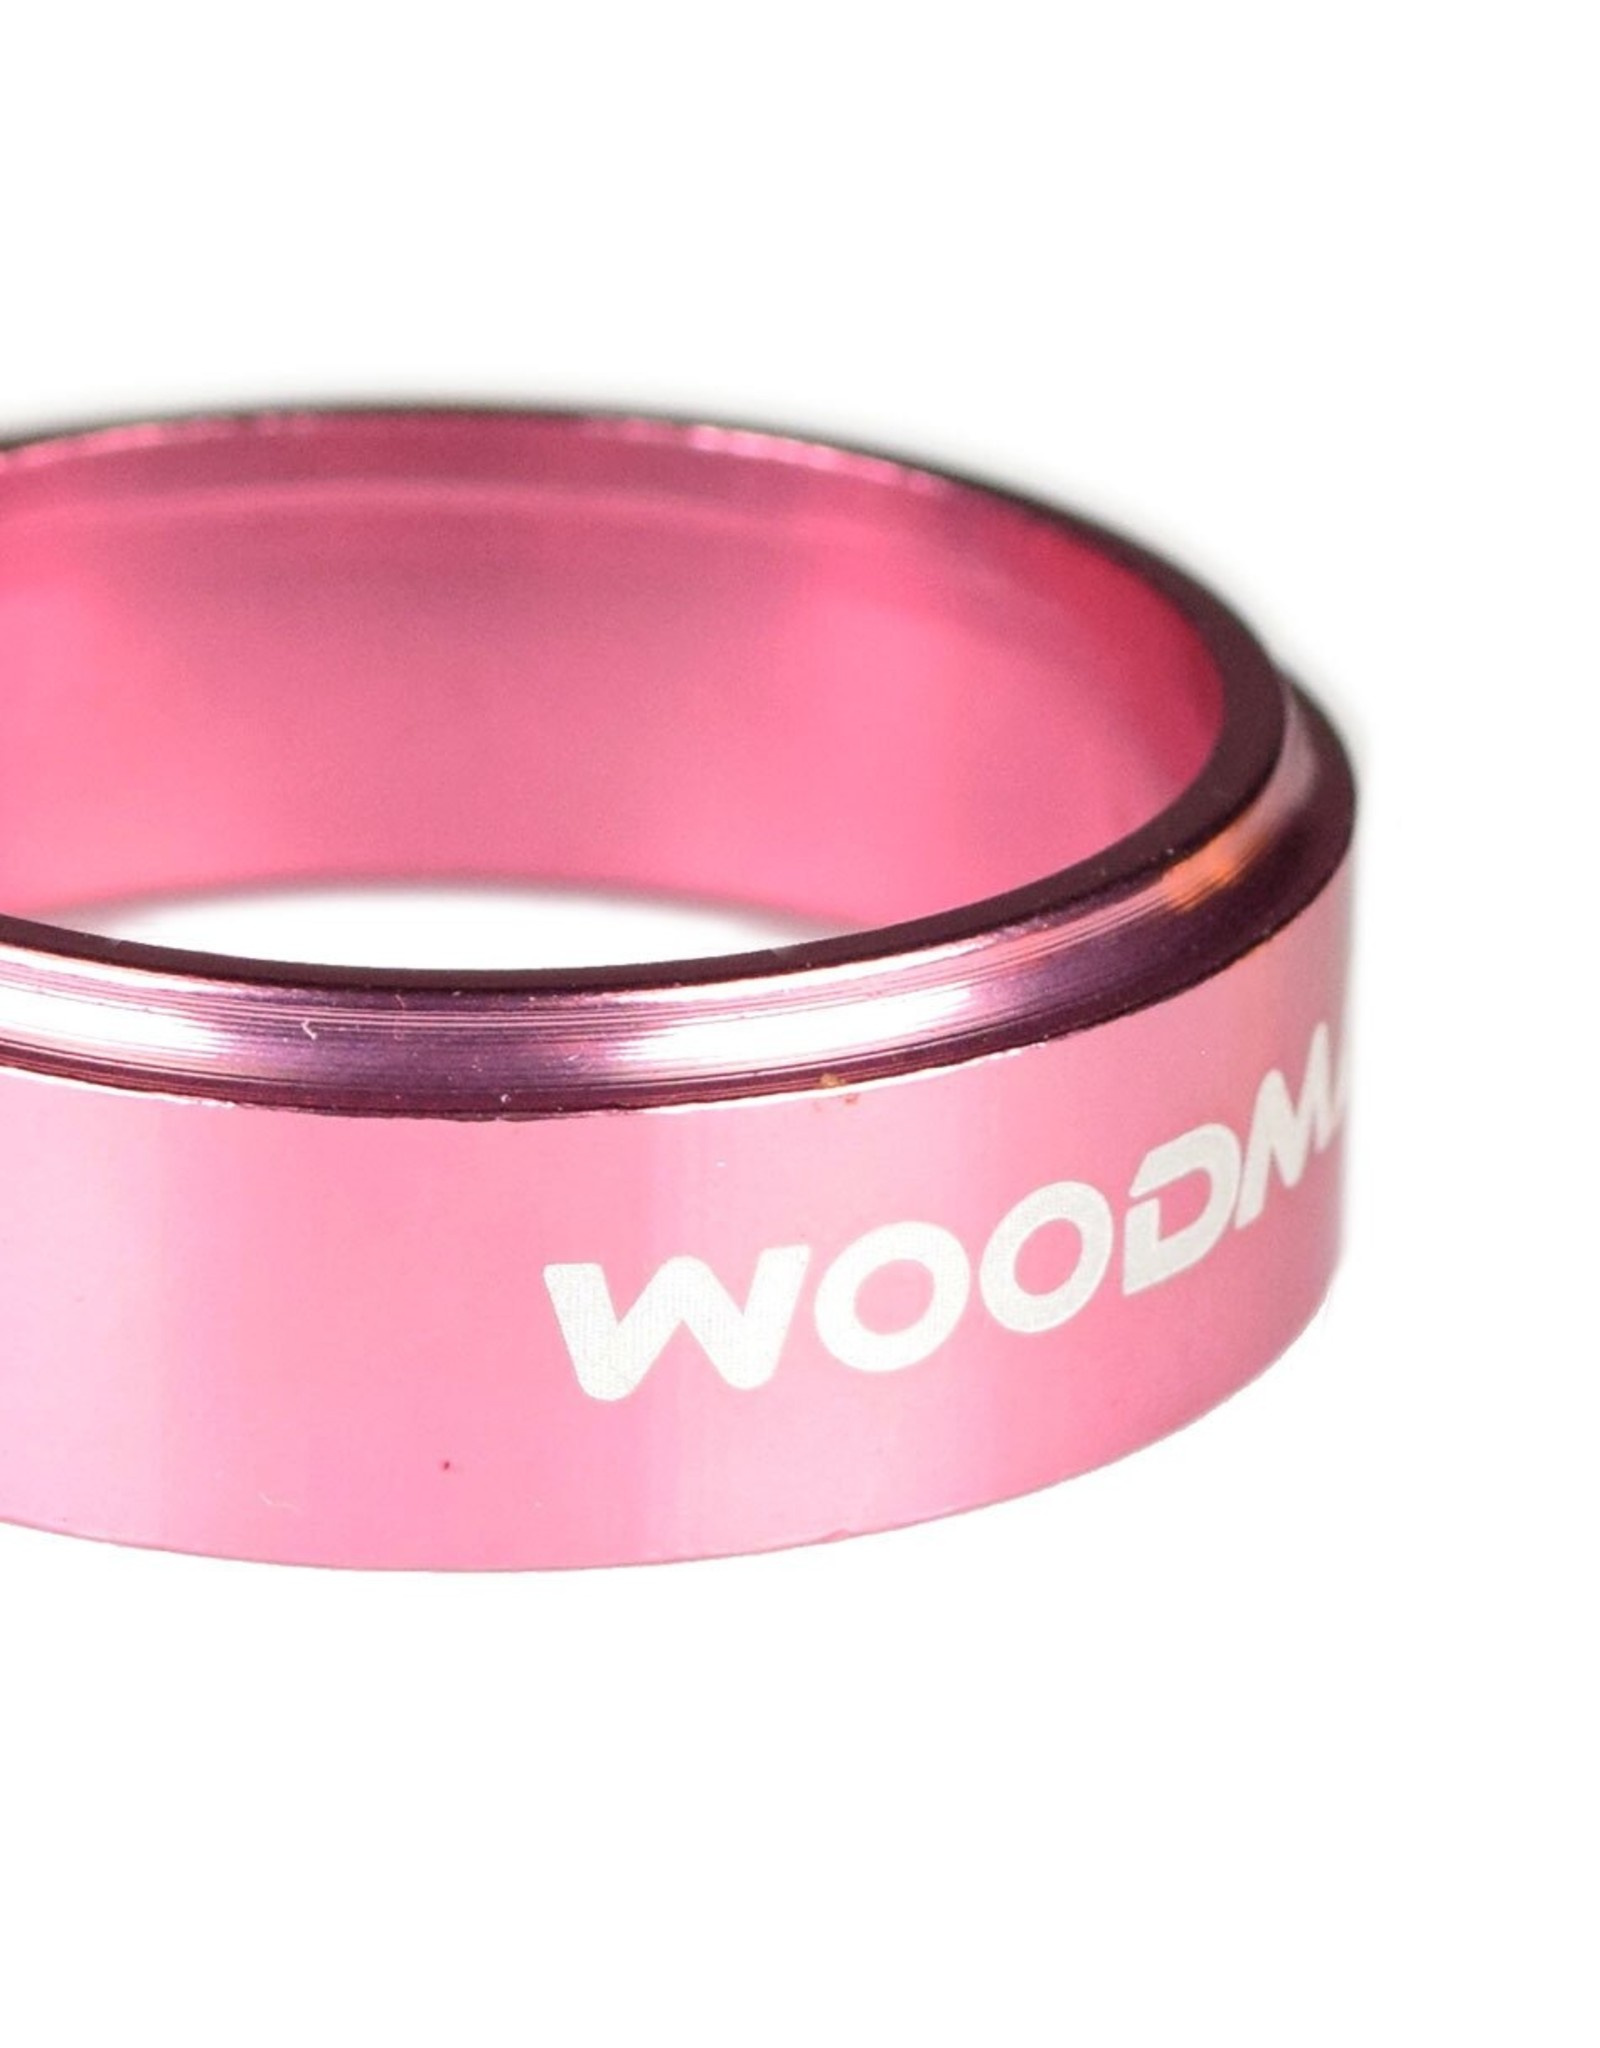 Woodman Woodman Deathgrip SL Seatpost Collar